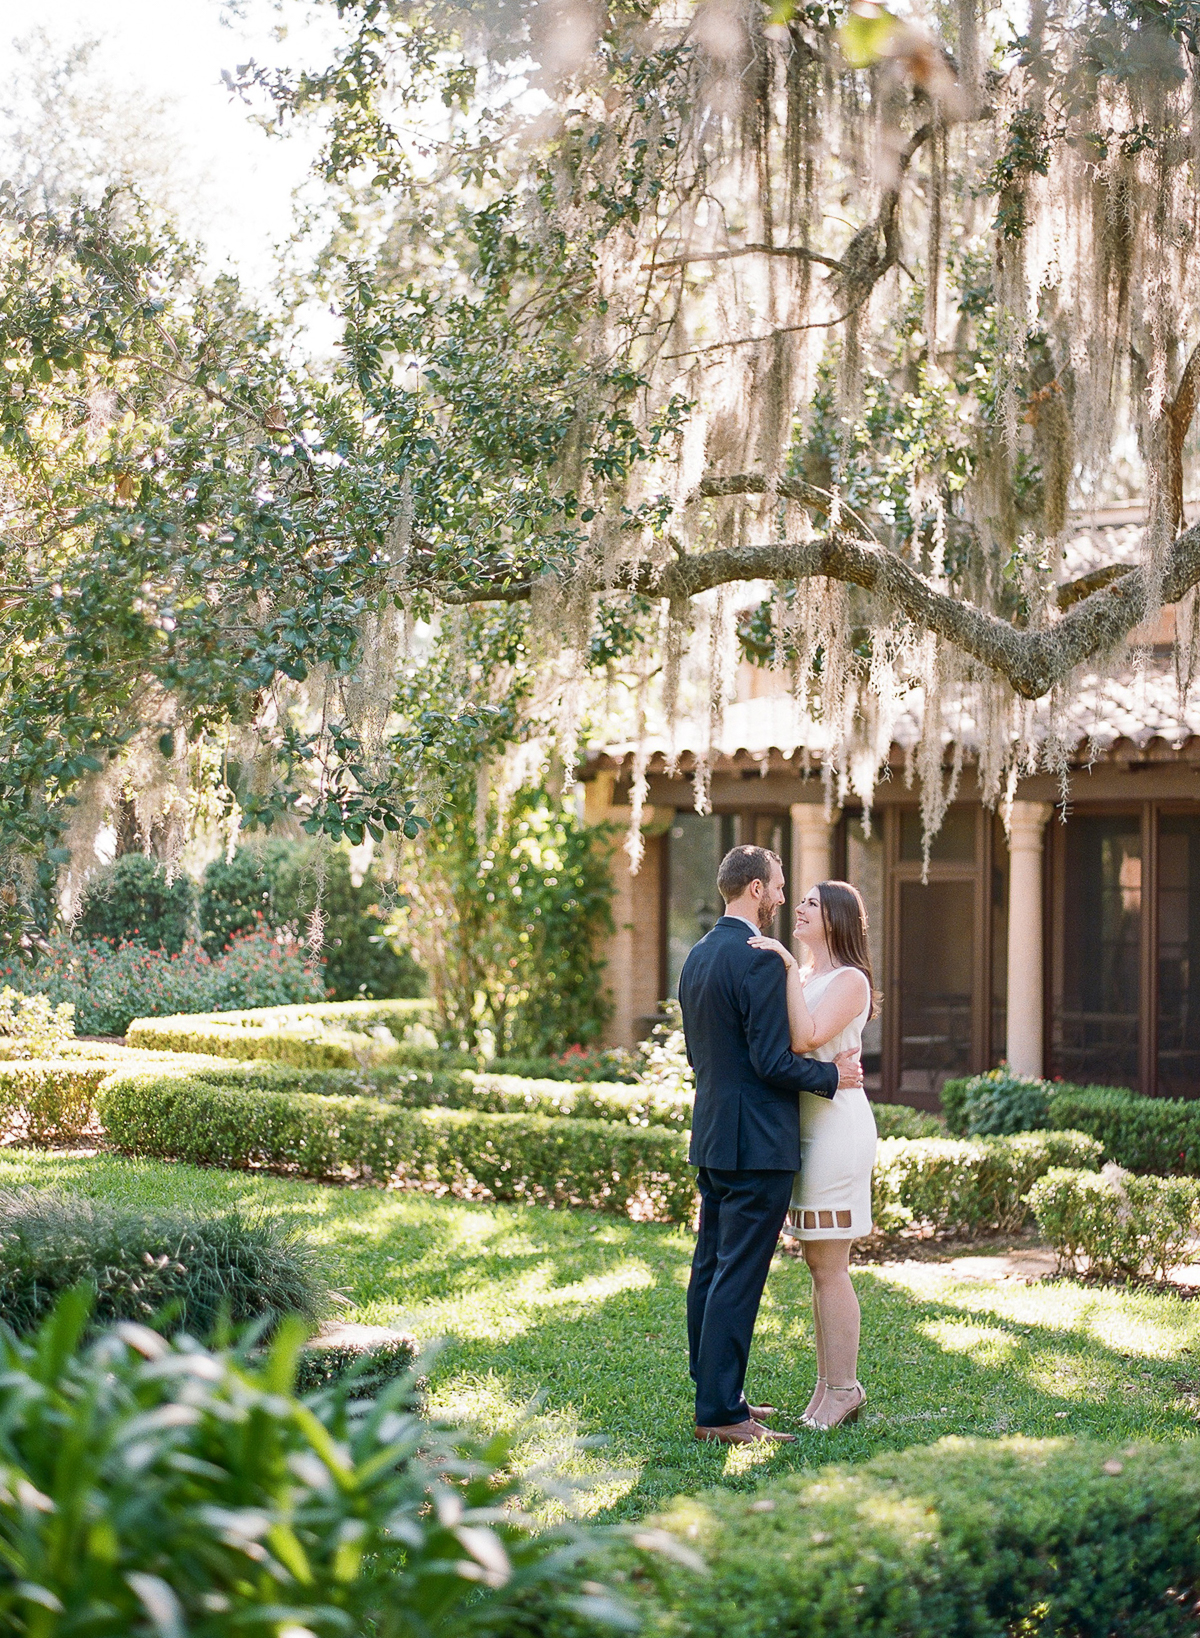 Timeless Florida Garden Engagement Session The Ganeys11